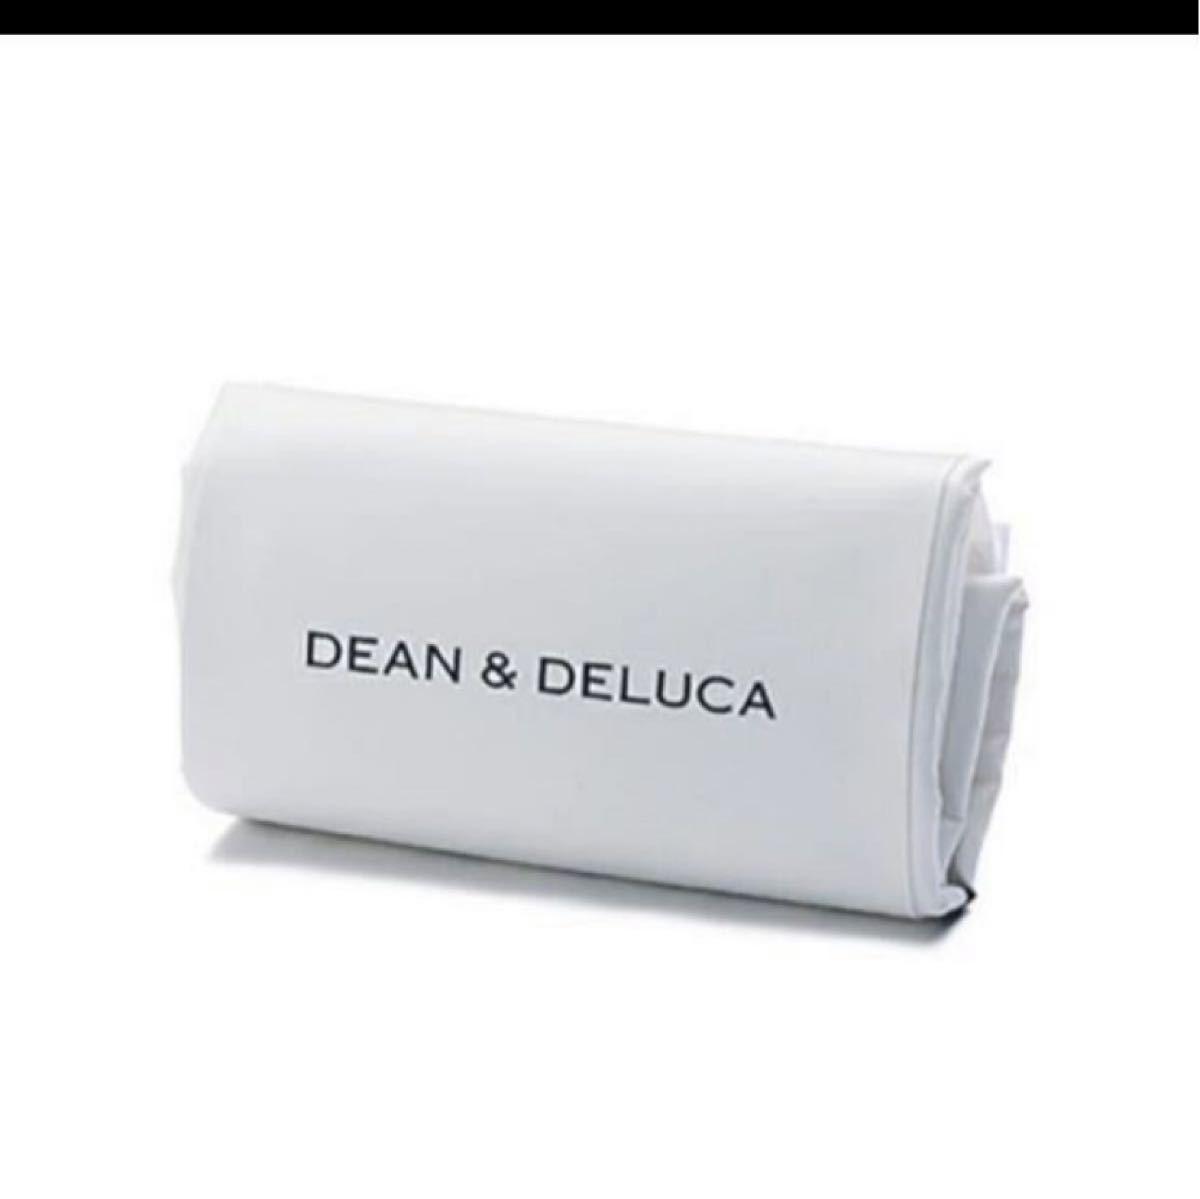 DEAN&DELUCA  トートバッグ 保冷バッグ       エコバック ベストセラーズバッグ3点セット